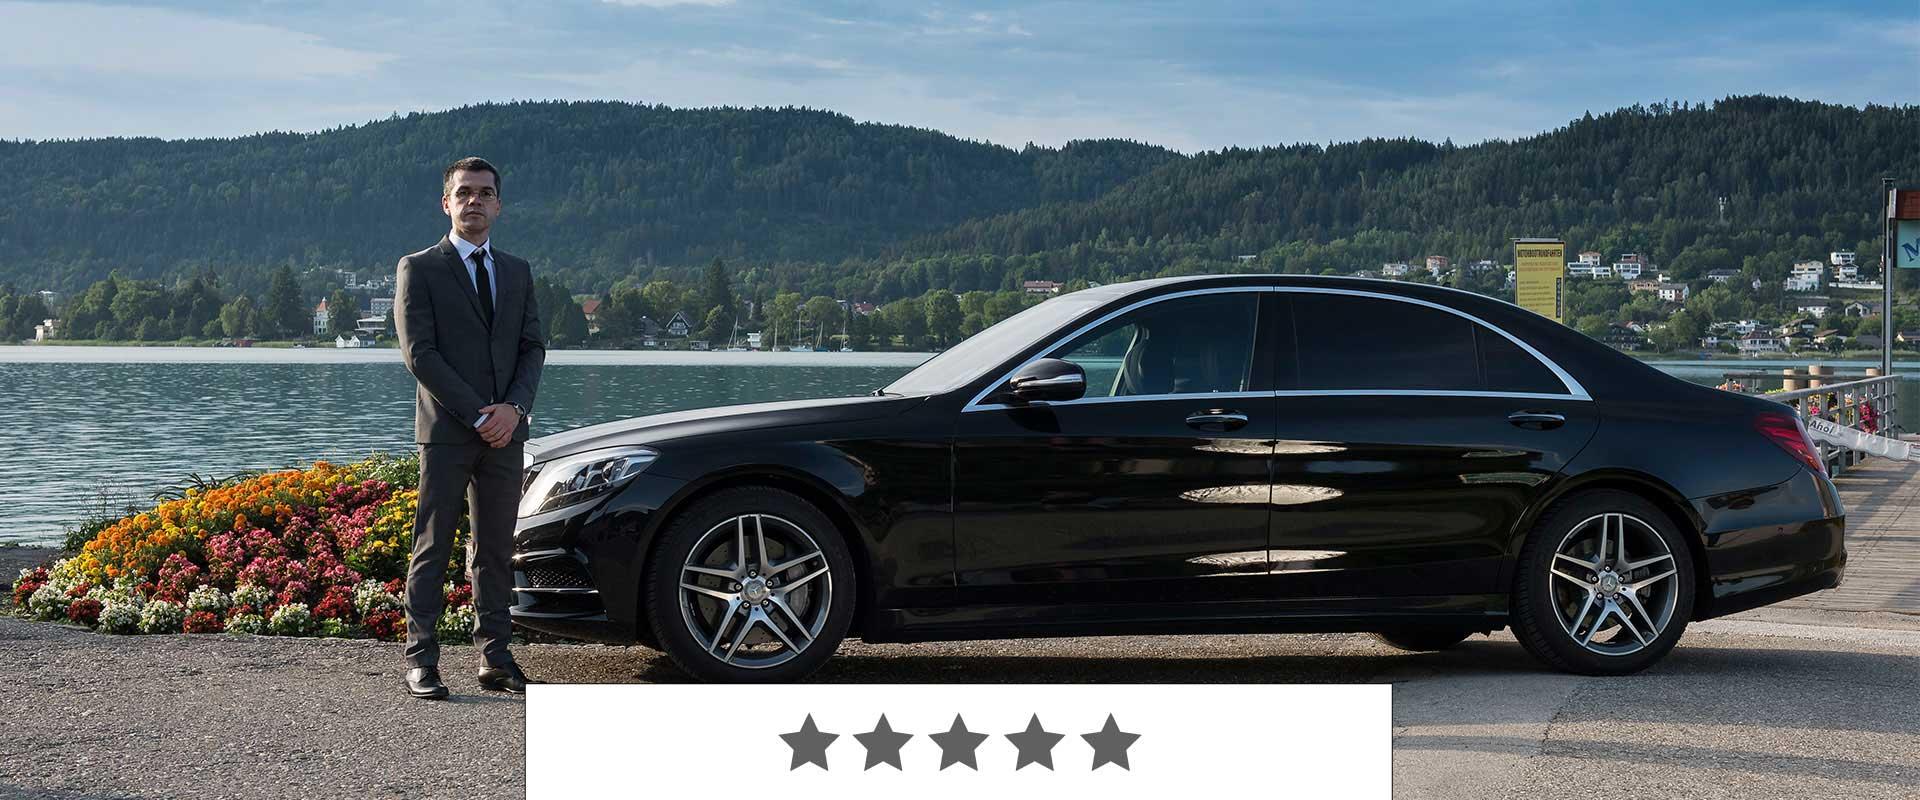 limousineservice-klagenfurt